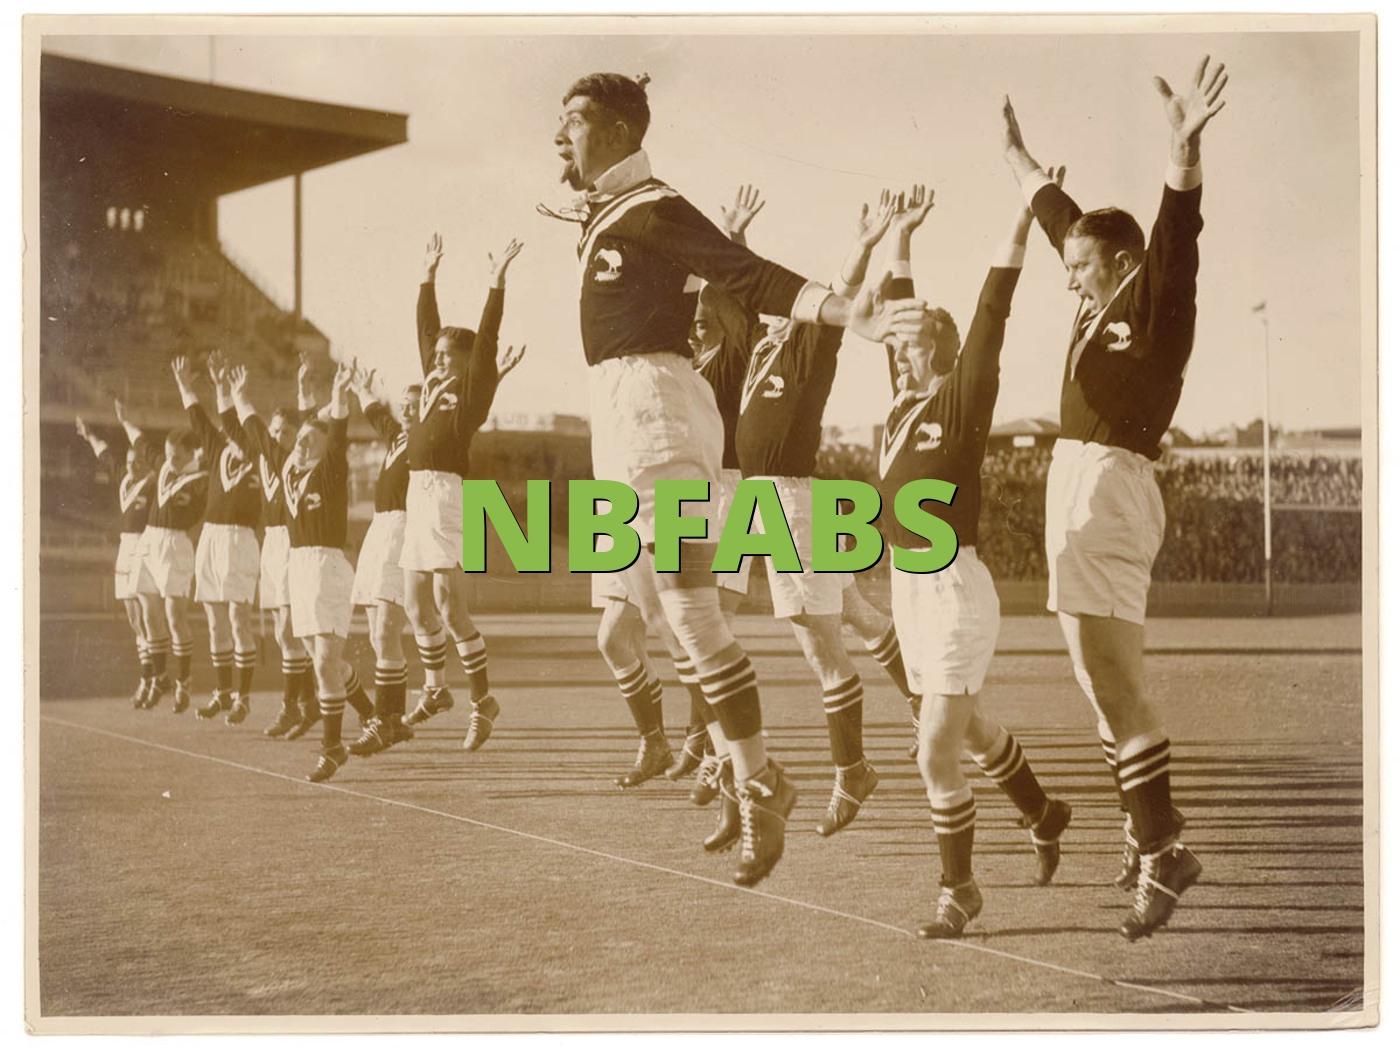 NBFABS